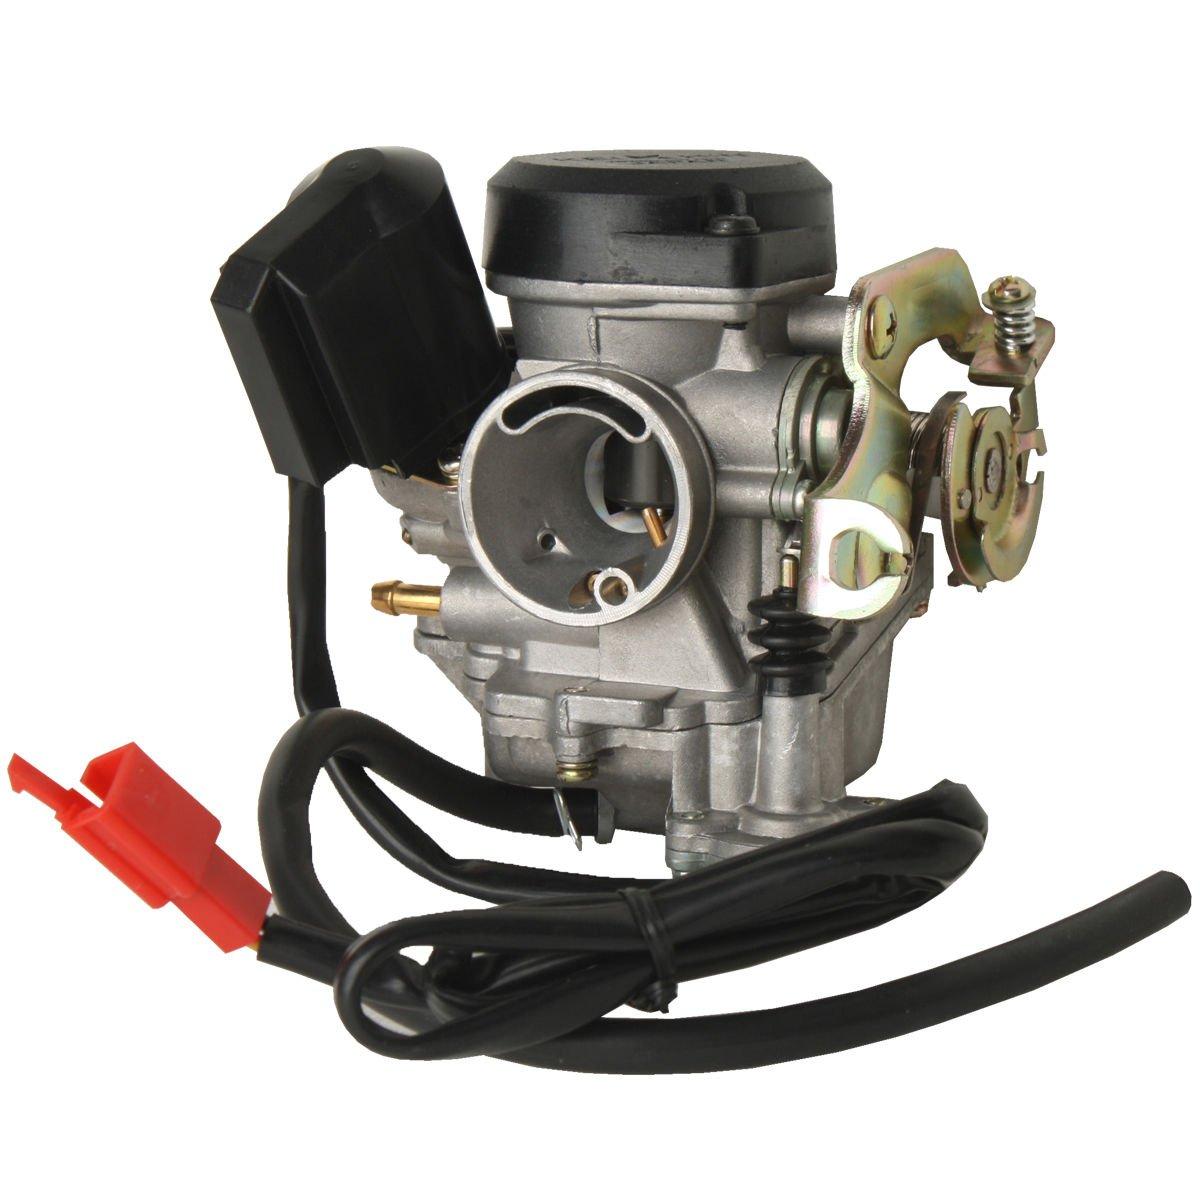 Amazon com: Lumix GC Carburetor For Kymco Agility 50 People